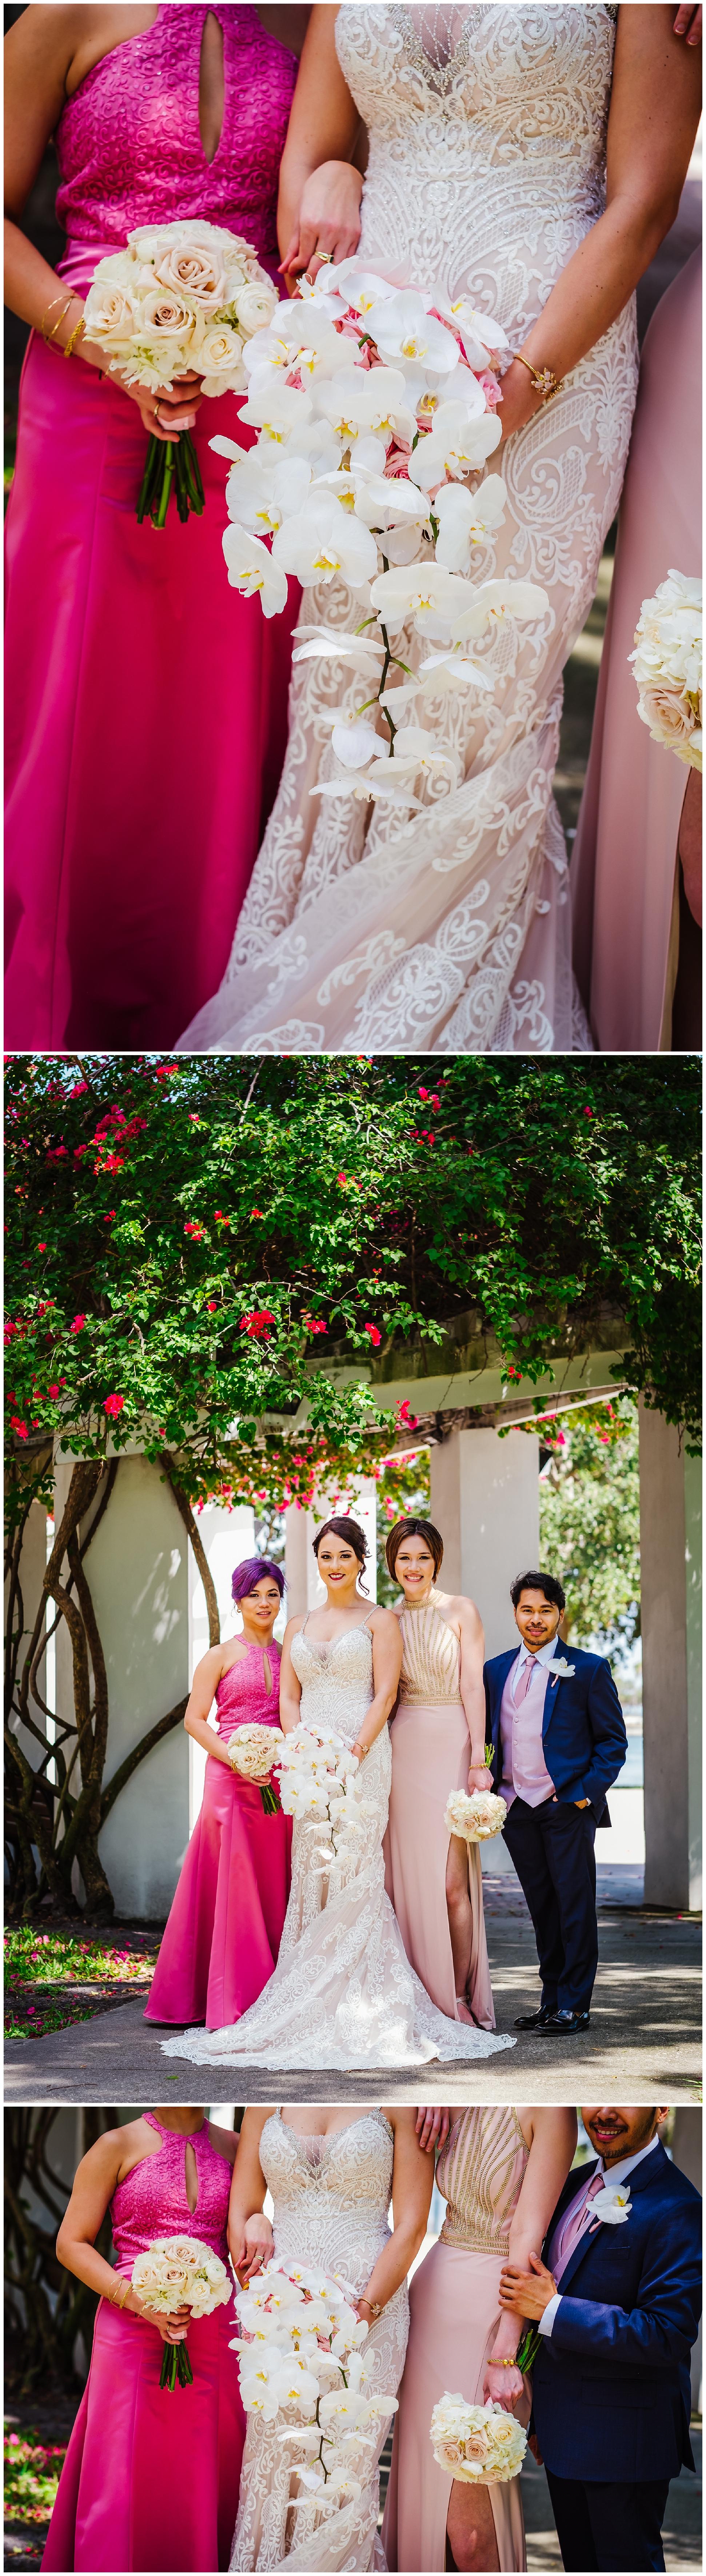 vinoy-sunset-ballroom-rainy-day-wedding-photography-orchids-trinidad-flawless-fetes-ashlee-hamon_0113.jpg